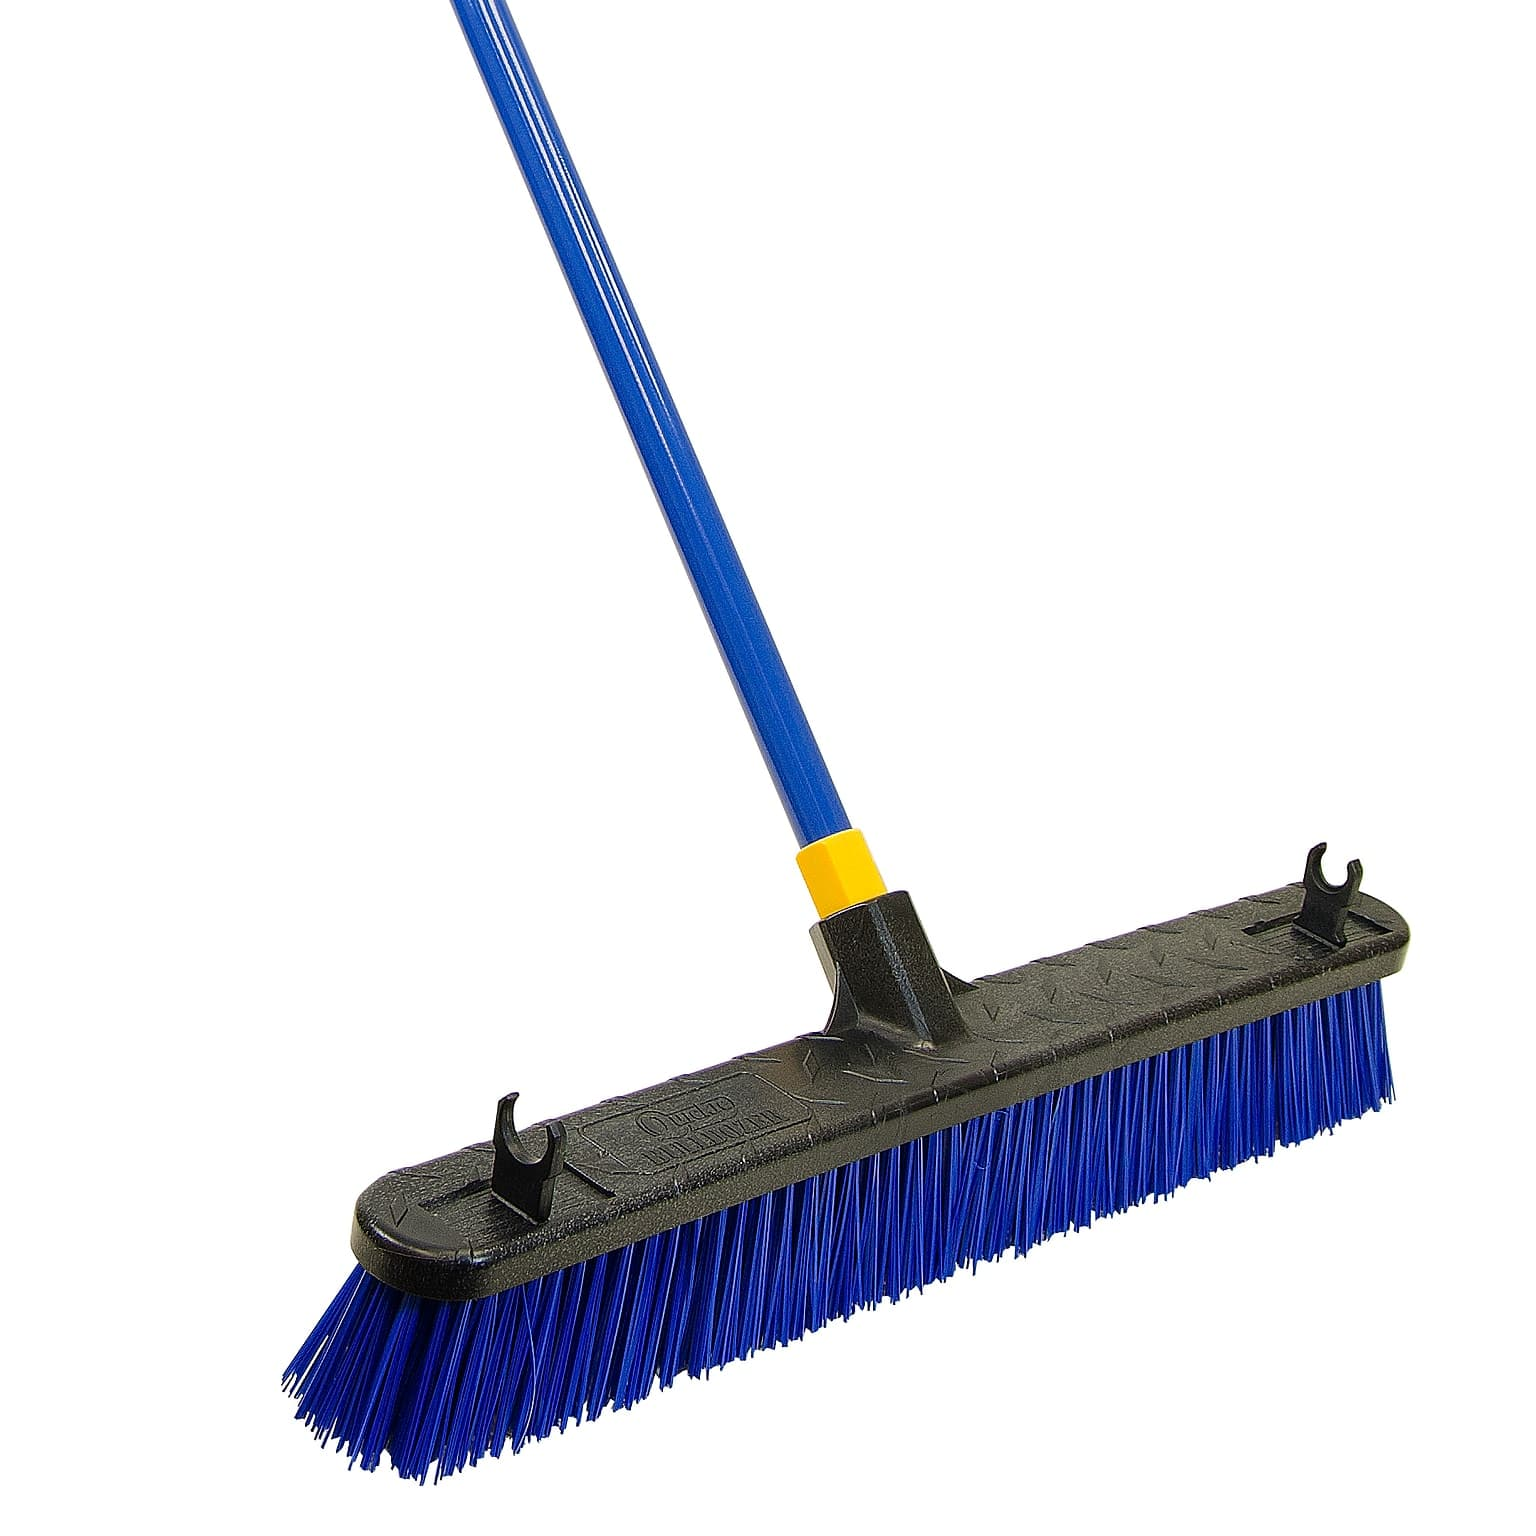 "Quickie Bulldozer 24"" Rough Surface Push Broom $7.85 + Free Shipping YMMV"